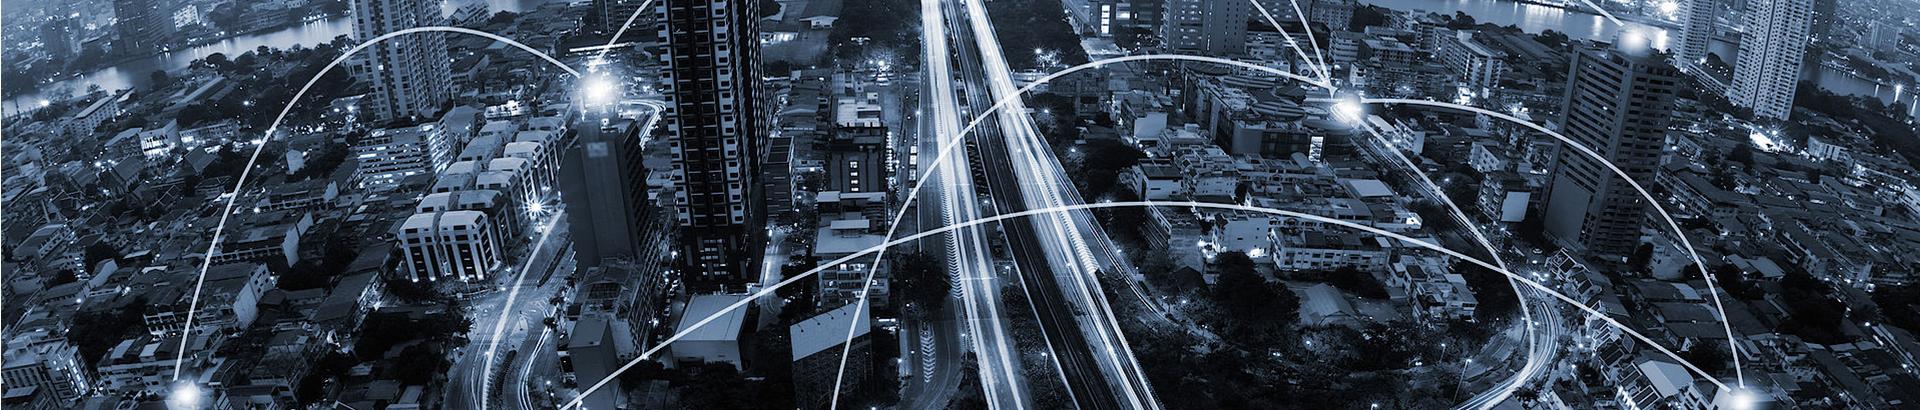 Consumer Electronics Industry Revolution